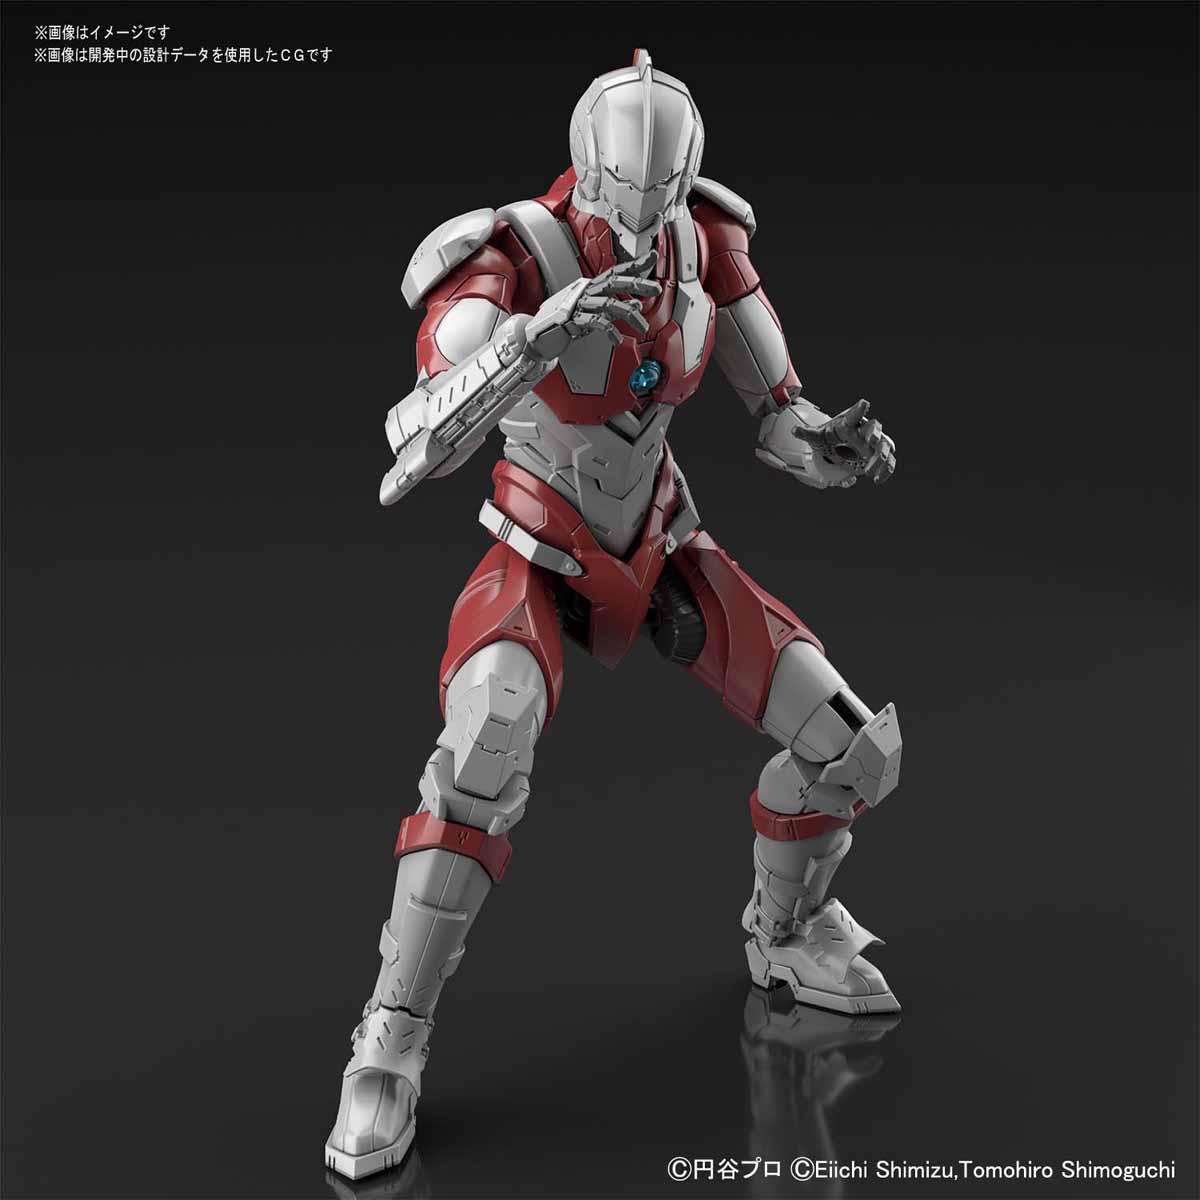 Figure-rise Standard『ULTRAMAN [B TYPE] -ACTION-』ウルトラマンスーツ 1/12 プラモデル-002